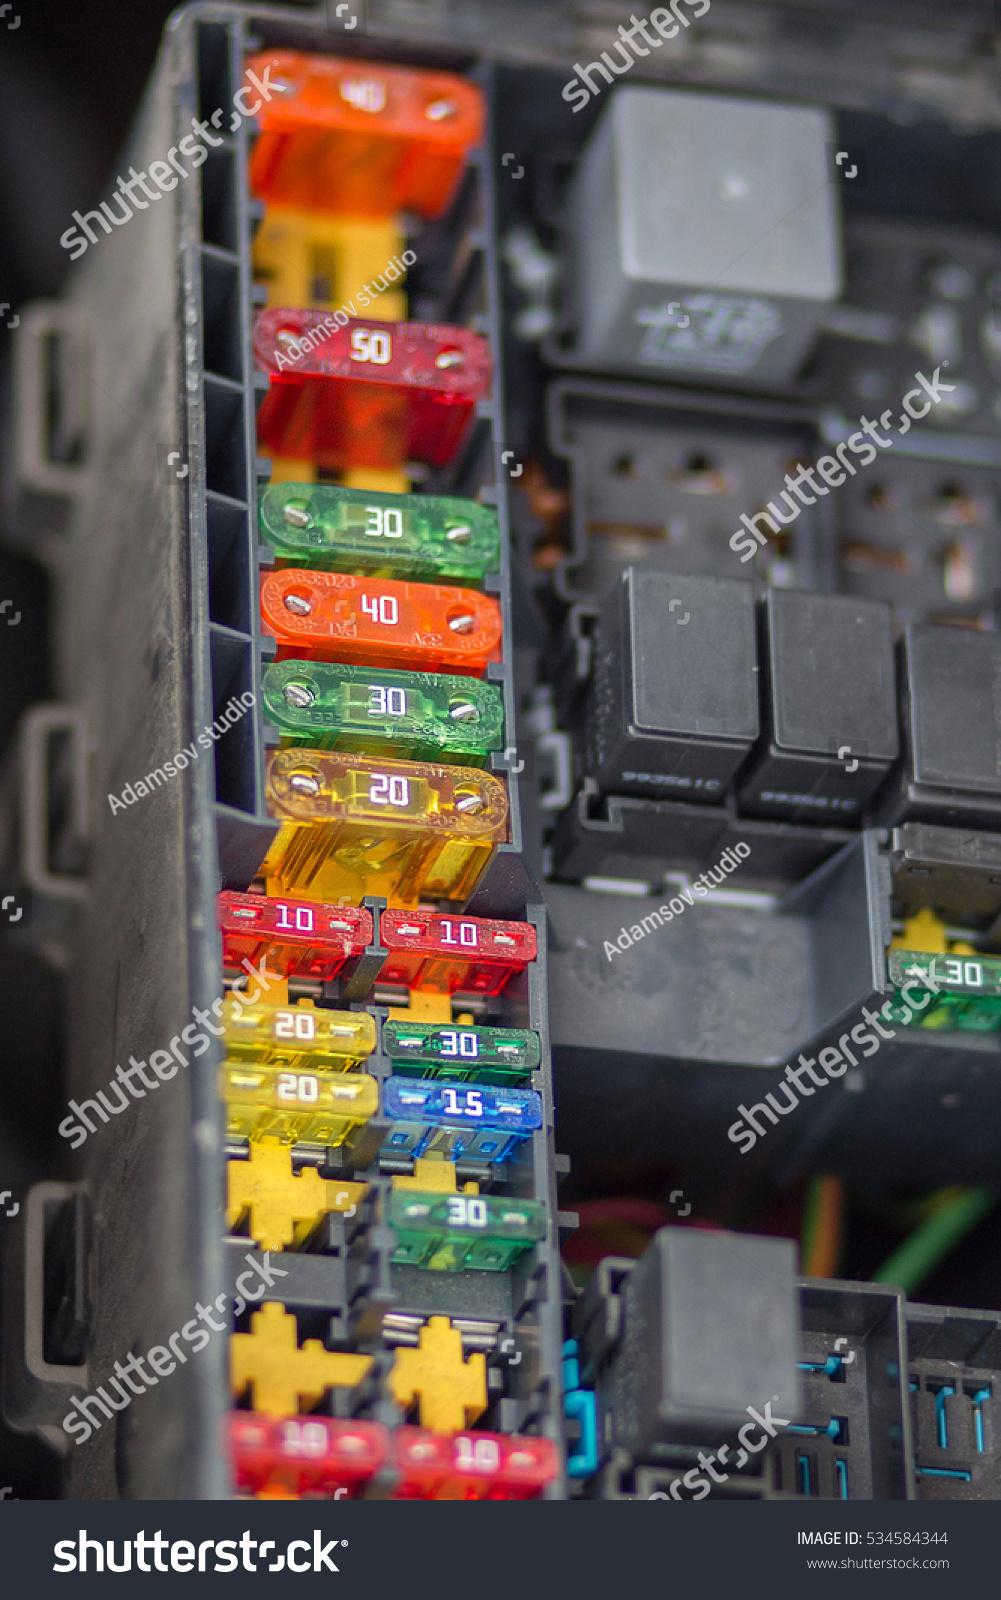 Close View Focus Car Fuse Box Stock Photo Edit Now 534584344 Plastic Up Of Control Engine Lighting